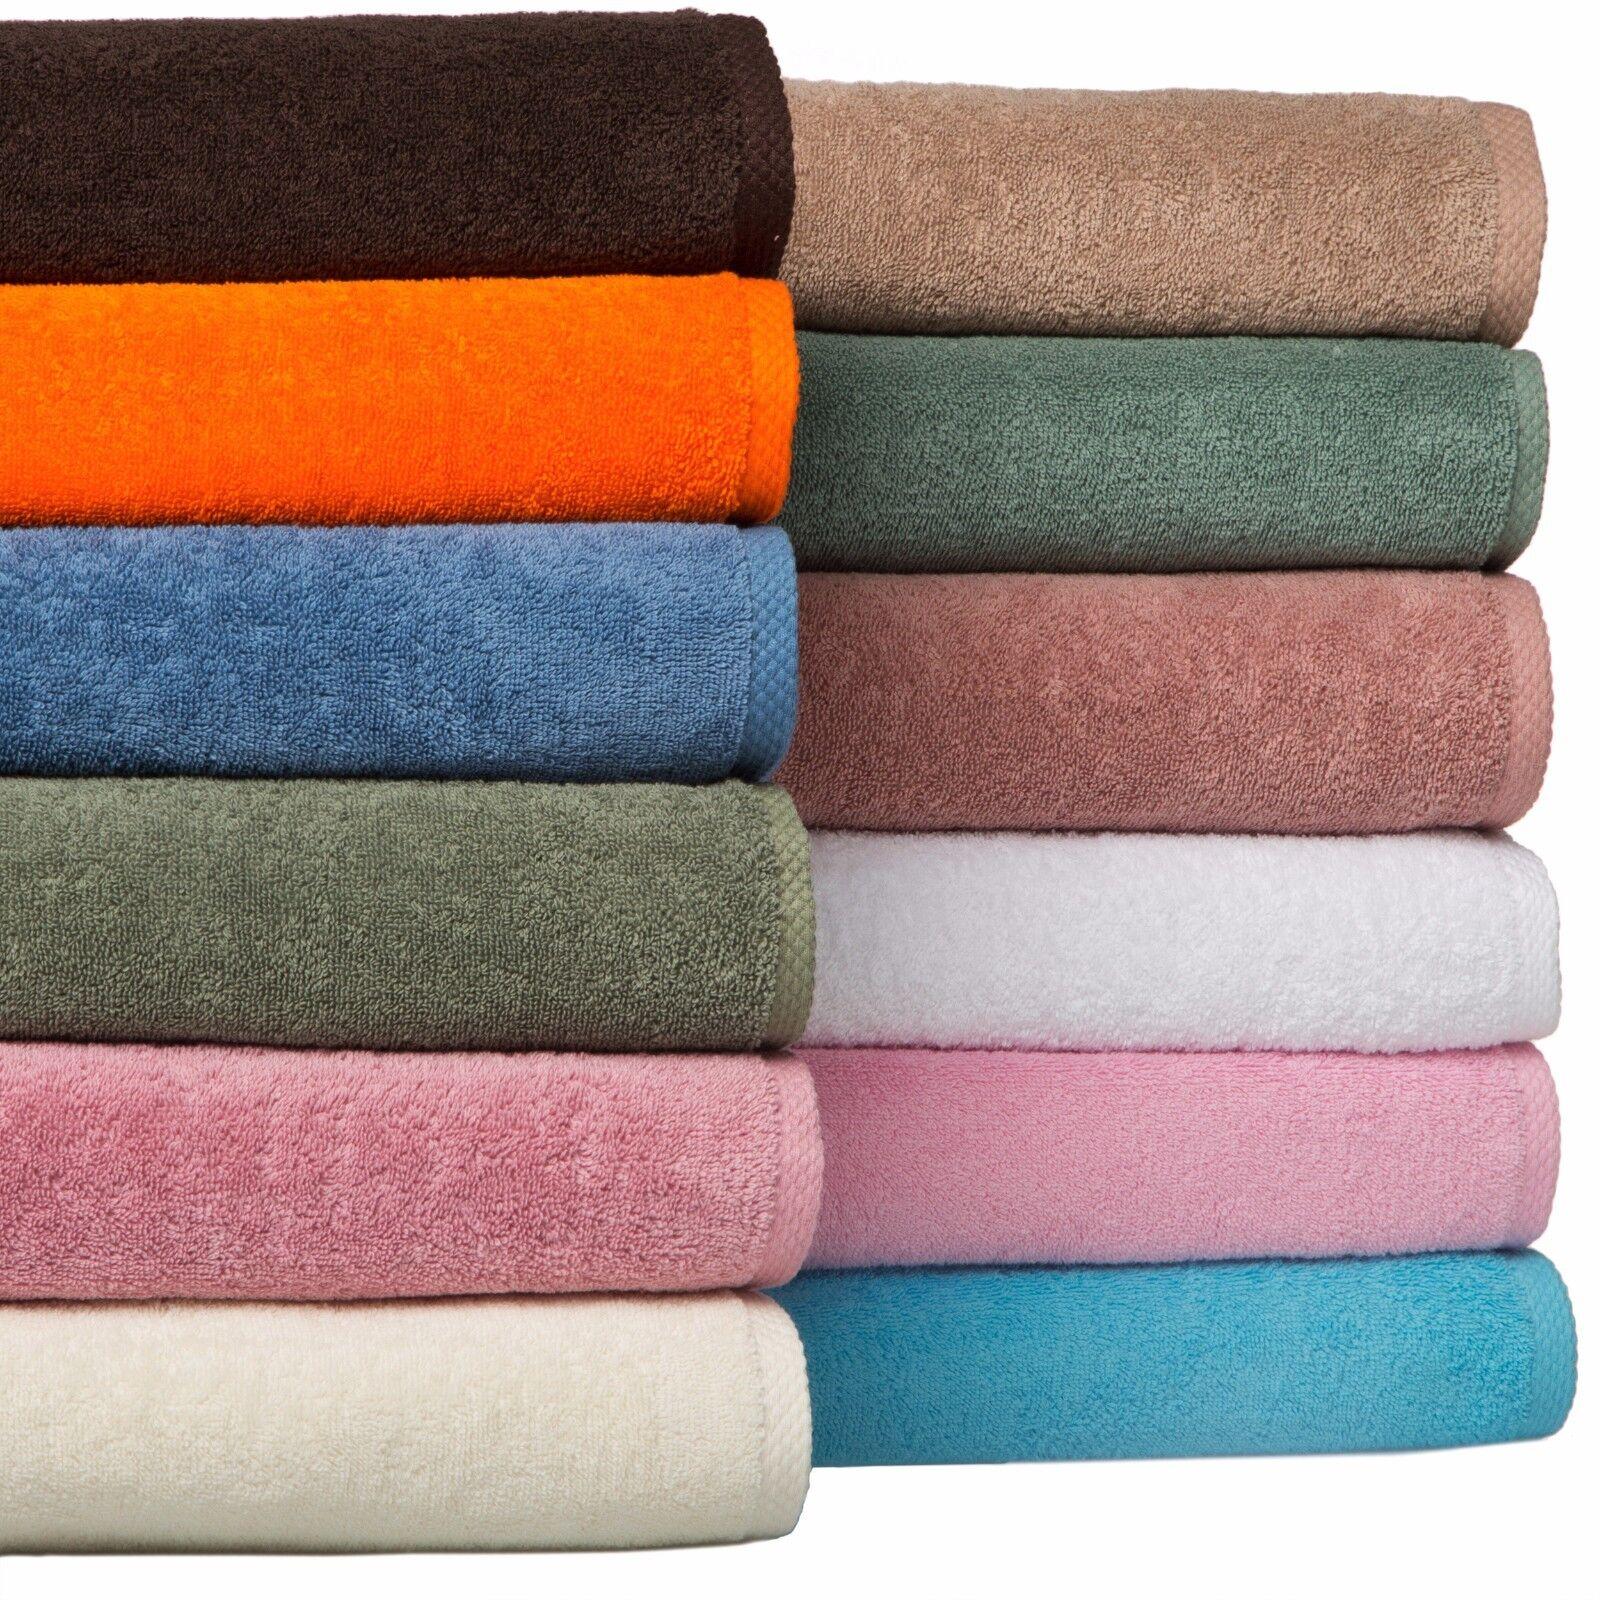 8 cotton bath towels set shower spa large bath sheets body face hand towel sets. Black Bedroom Furniture Sets. Home Design Ideas